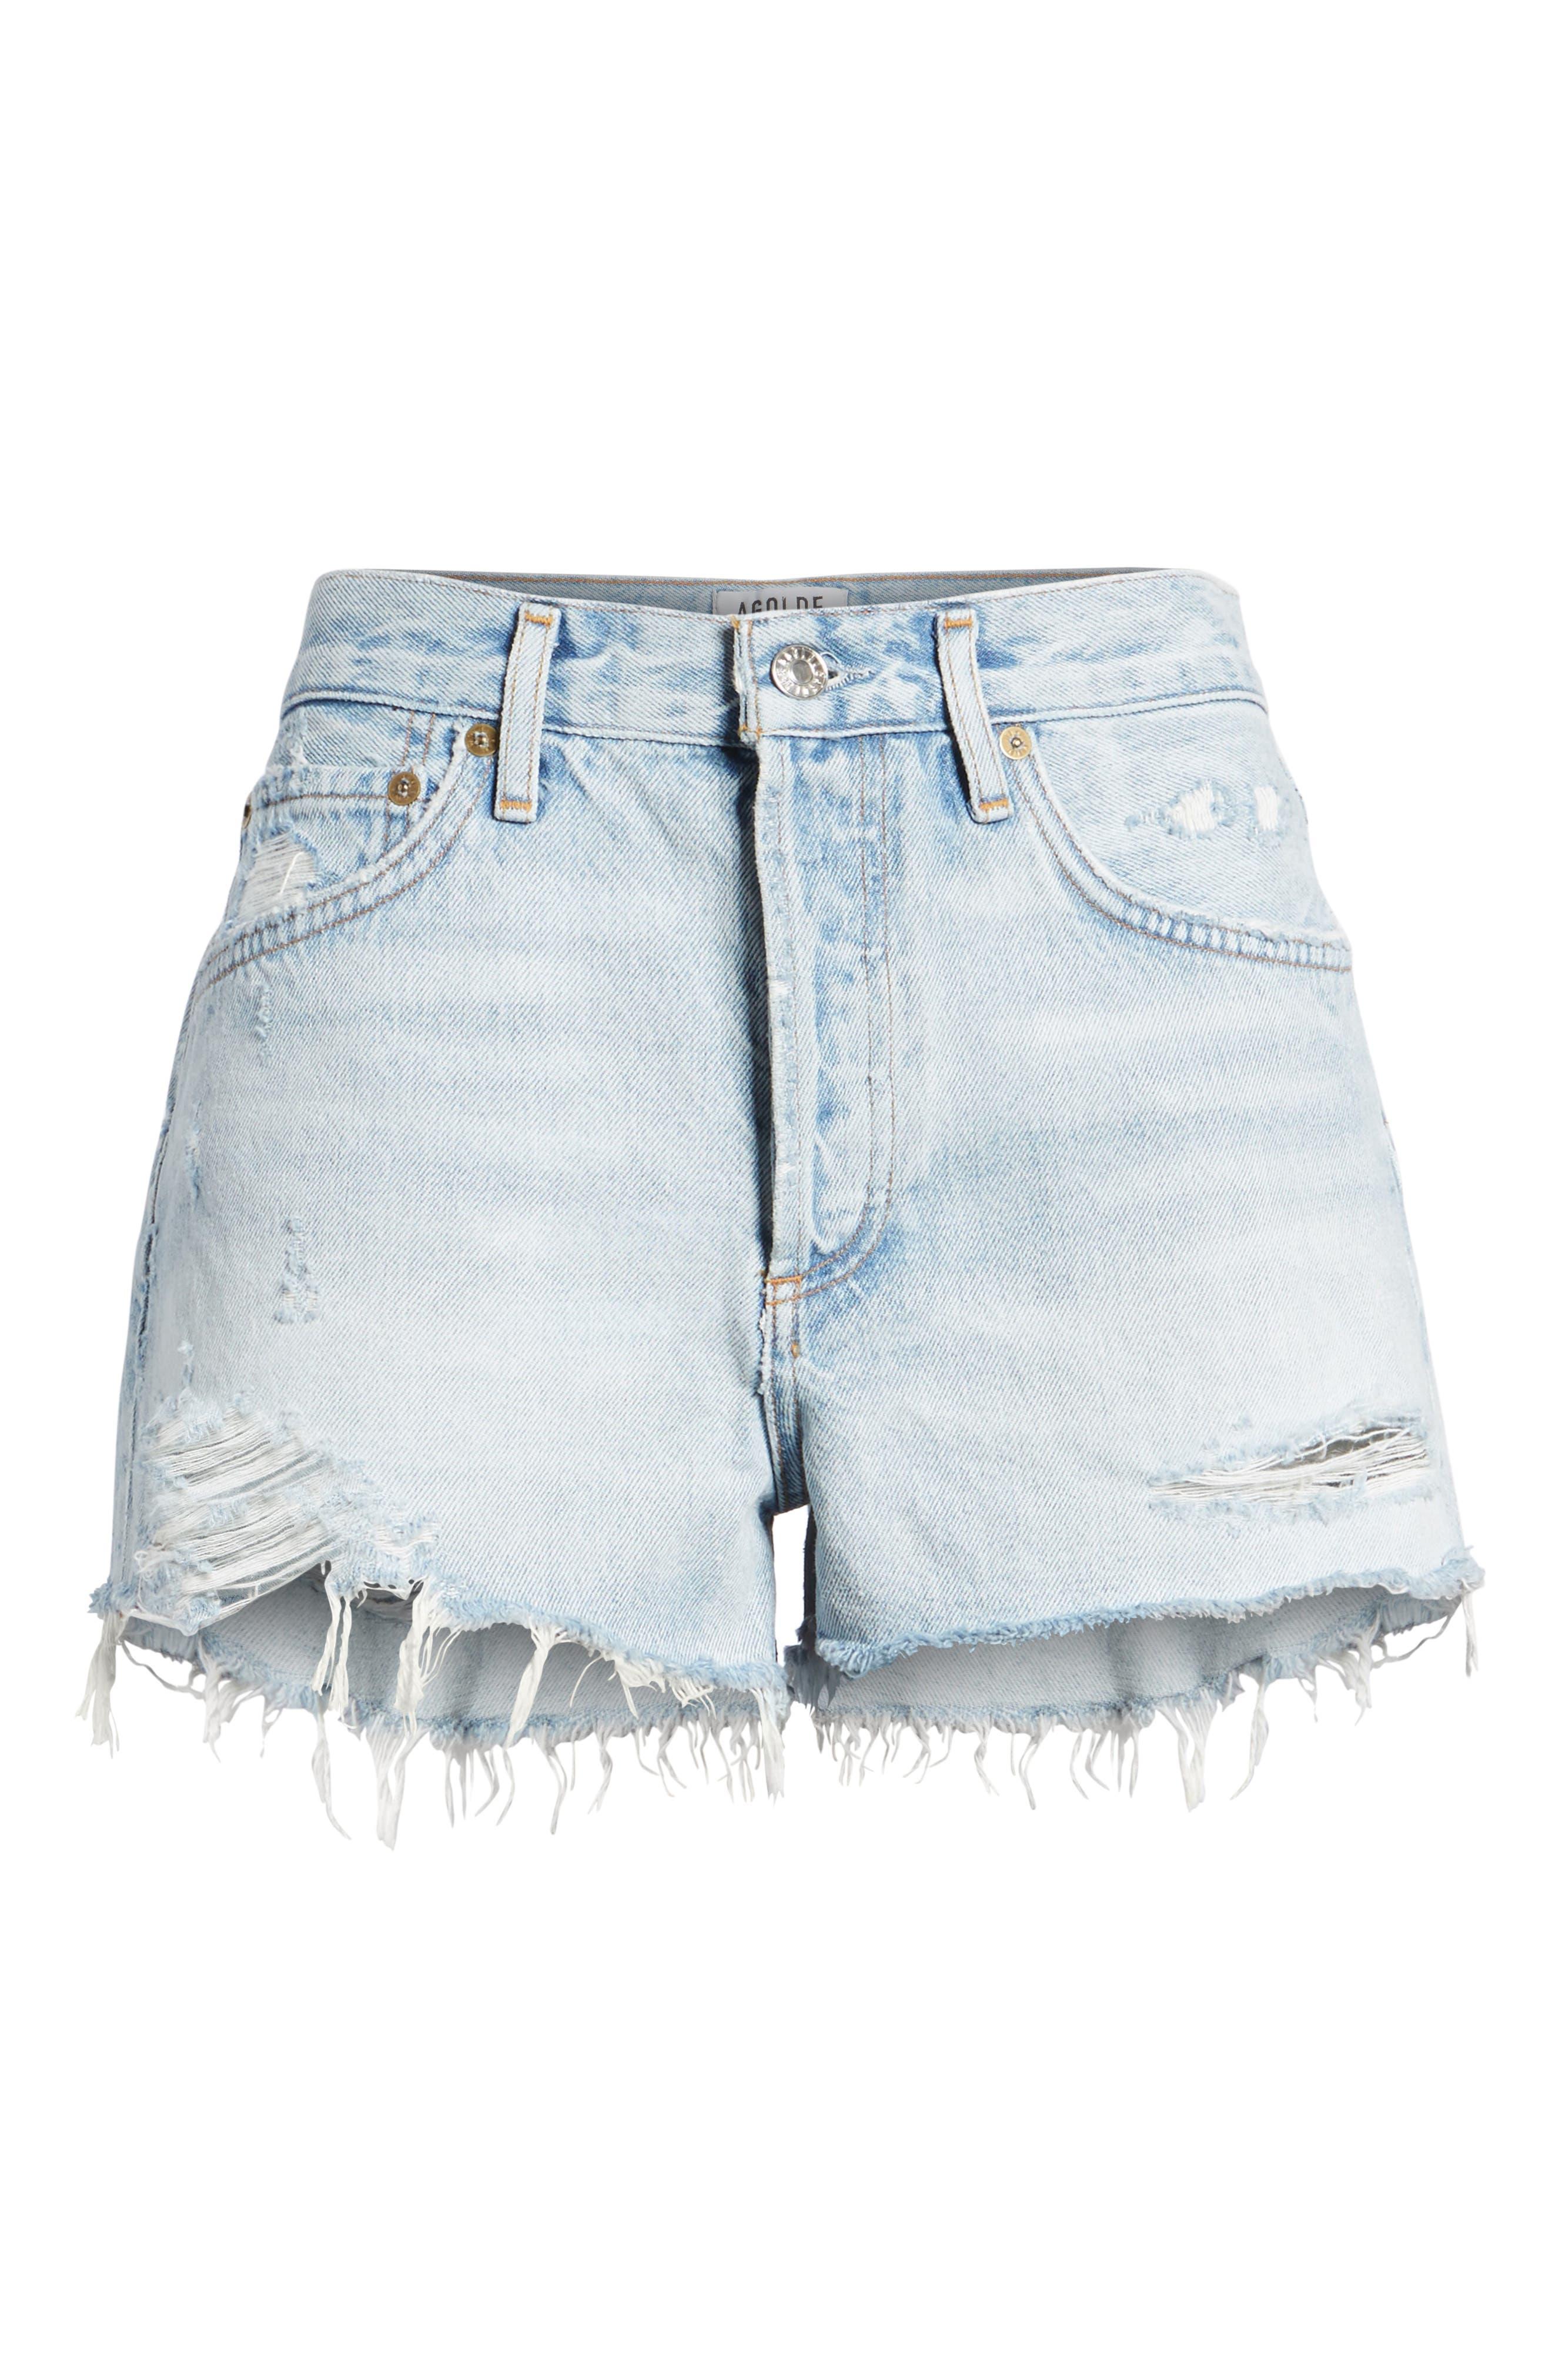 Parker Distressed Denim Shorts,                             Alternate thumbnail 6, color,                             Broken